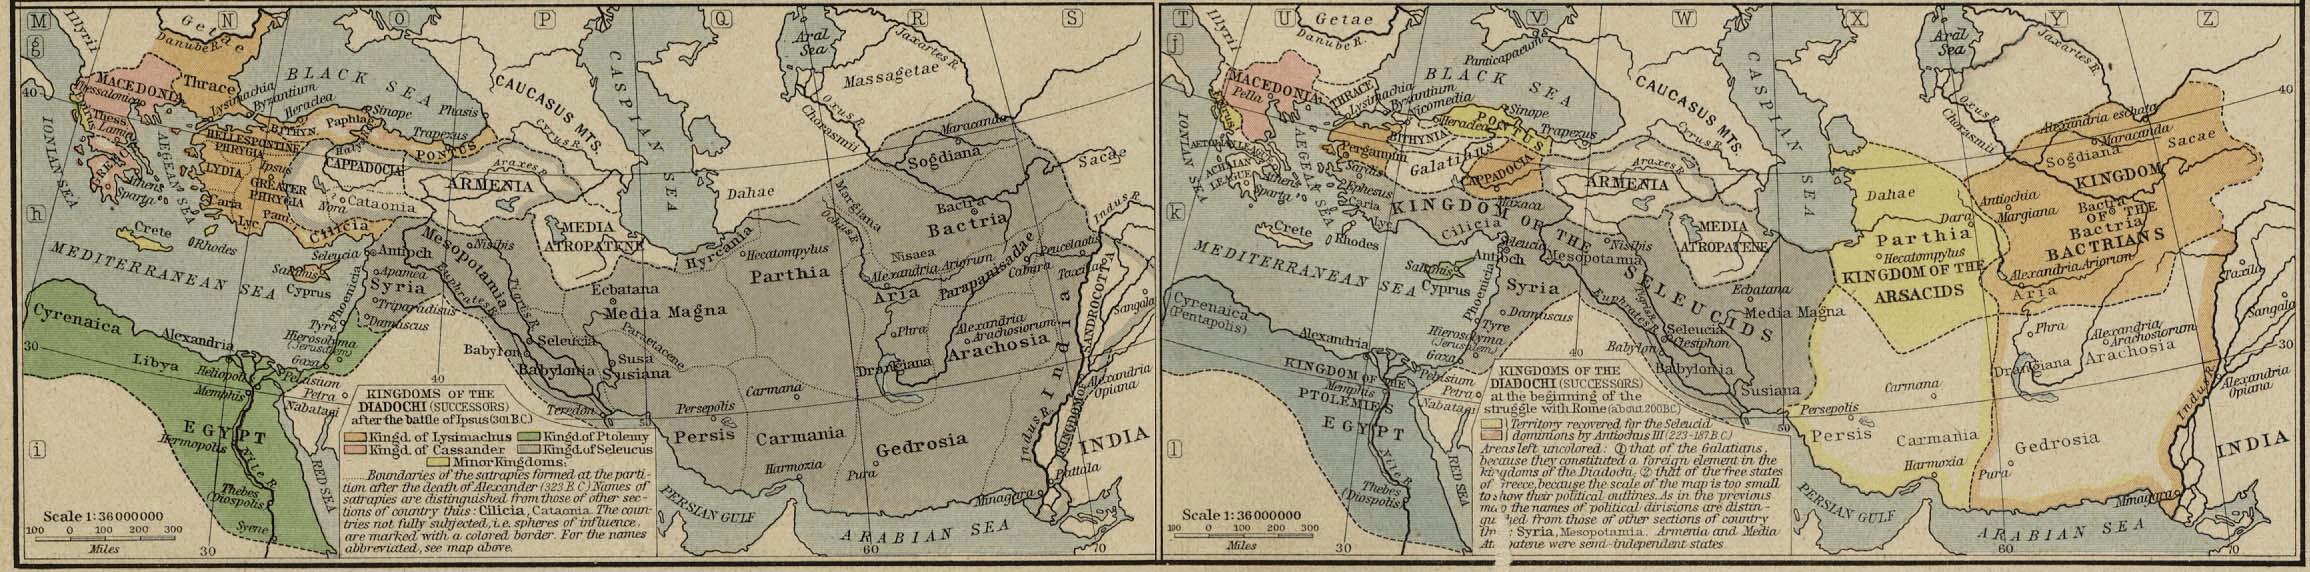 Pergamon - Diadochi Kingdoms 301 BCE